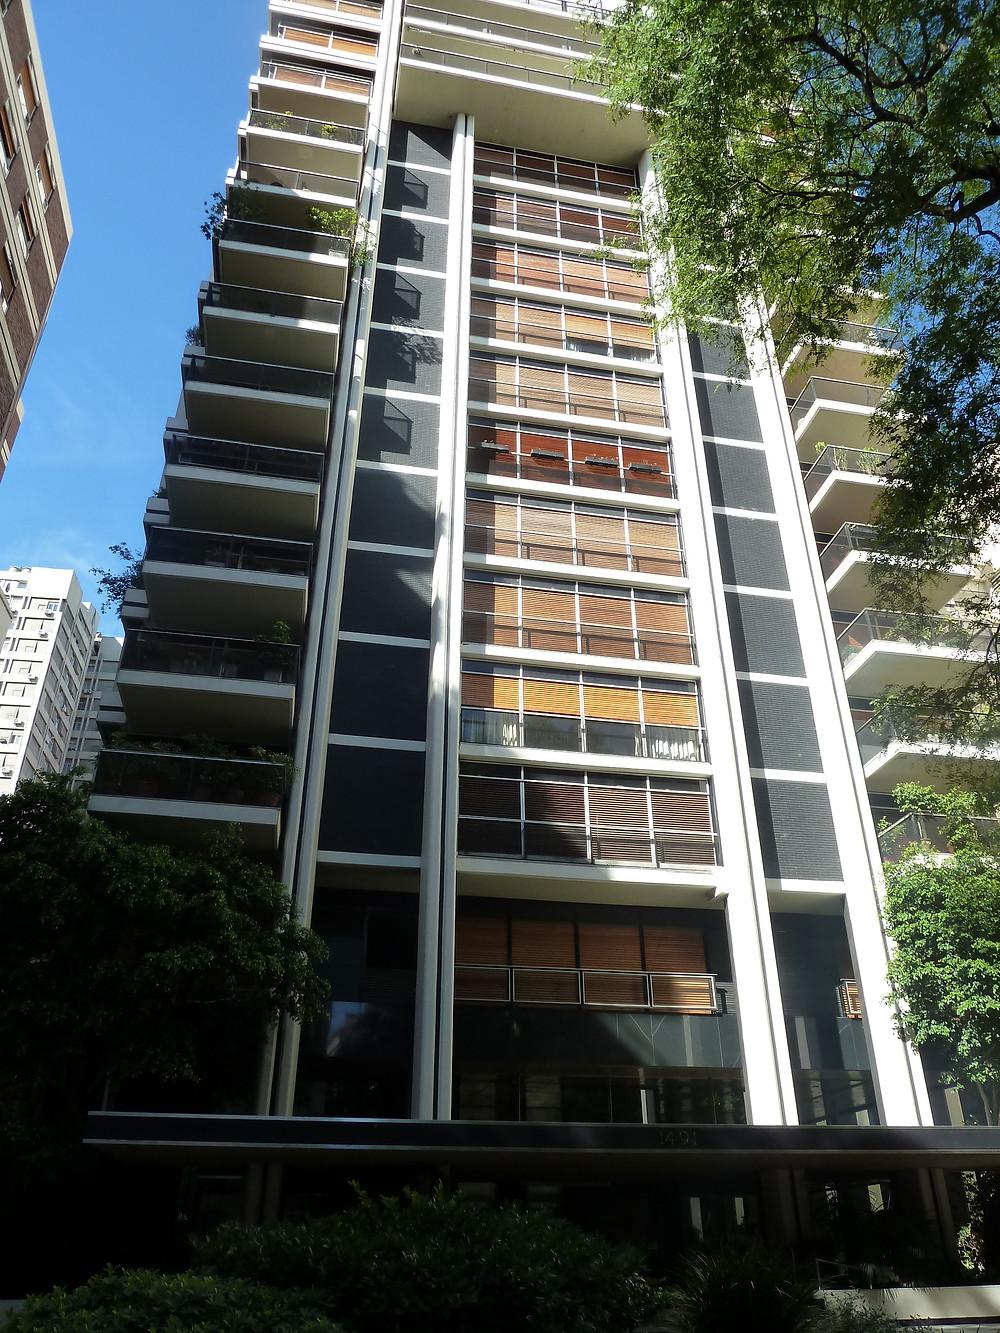 Modern Building in Recoletta Neighborhood of Buenos Aires